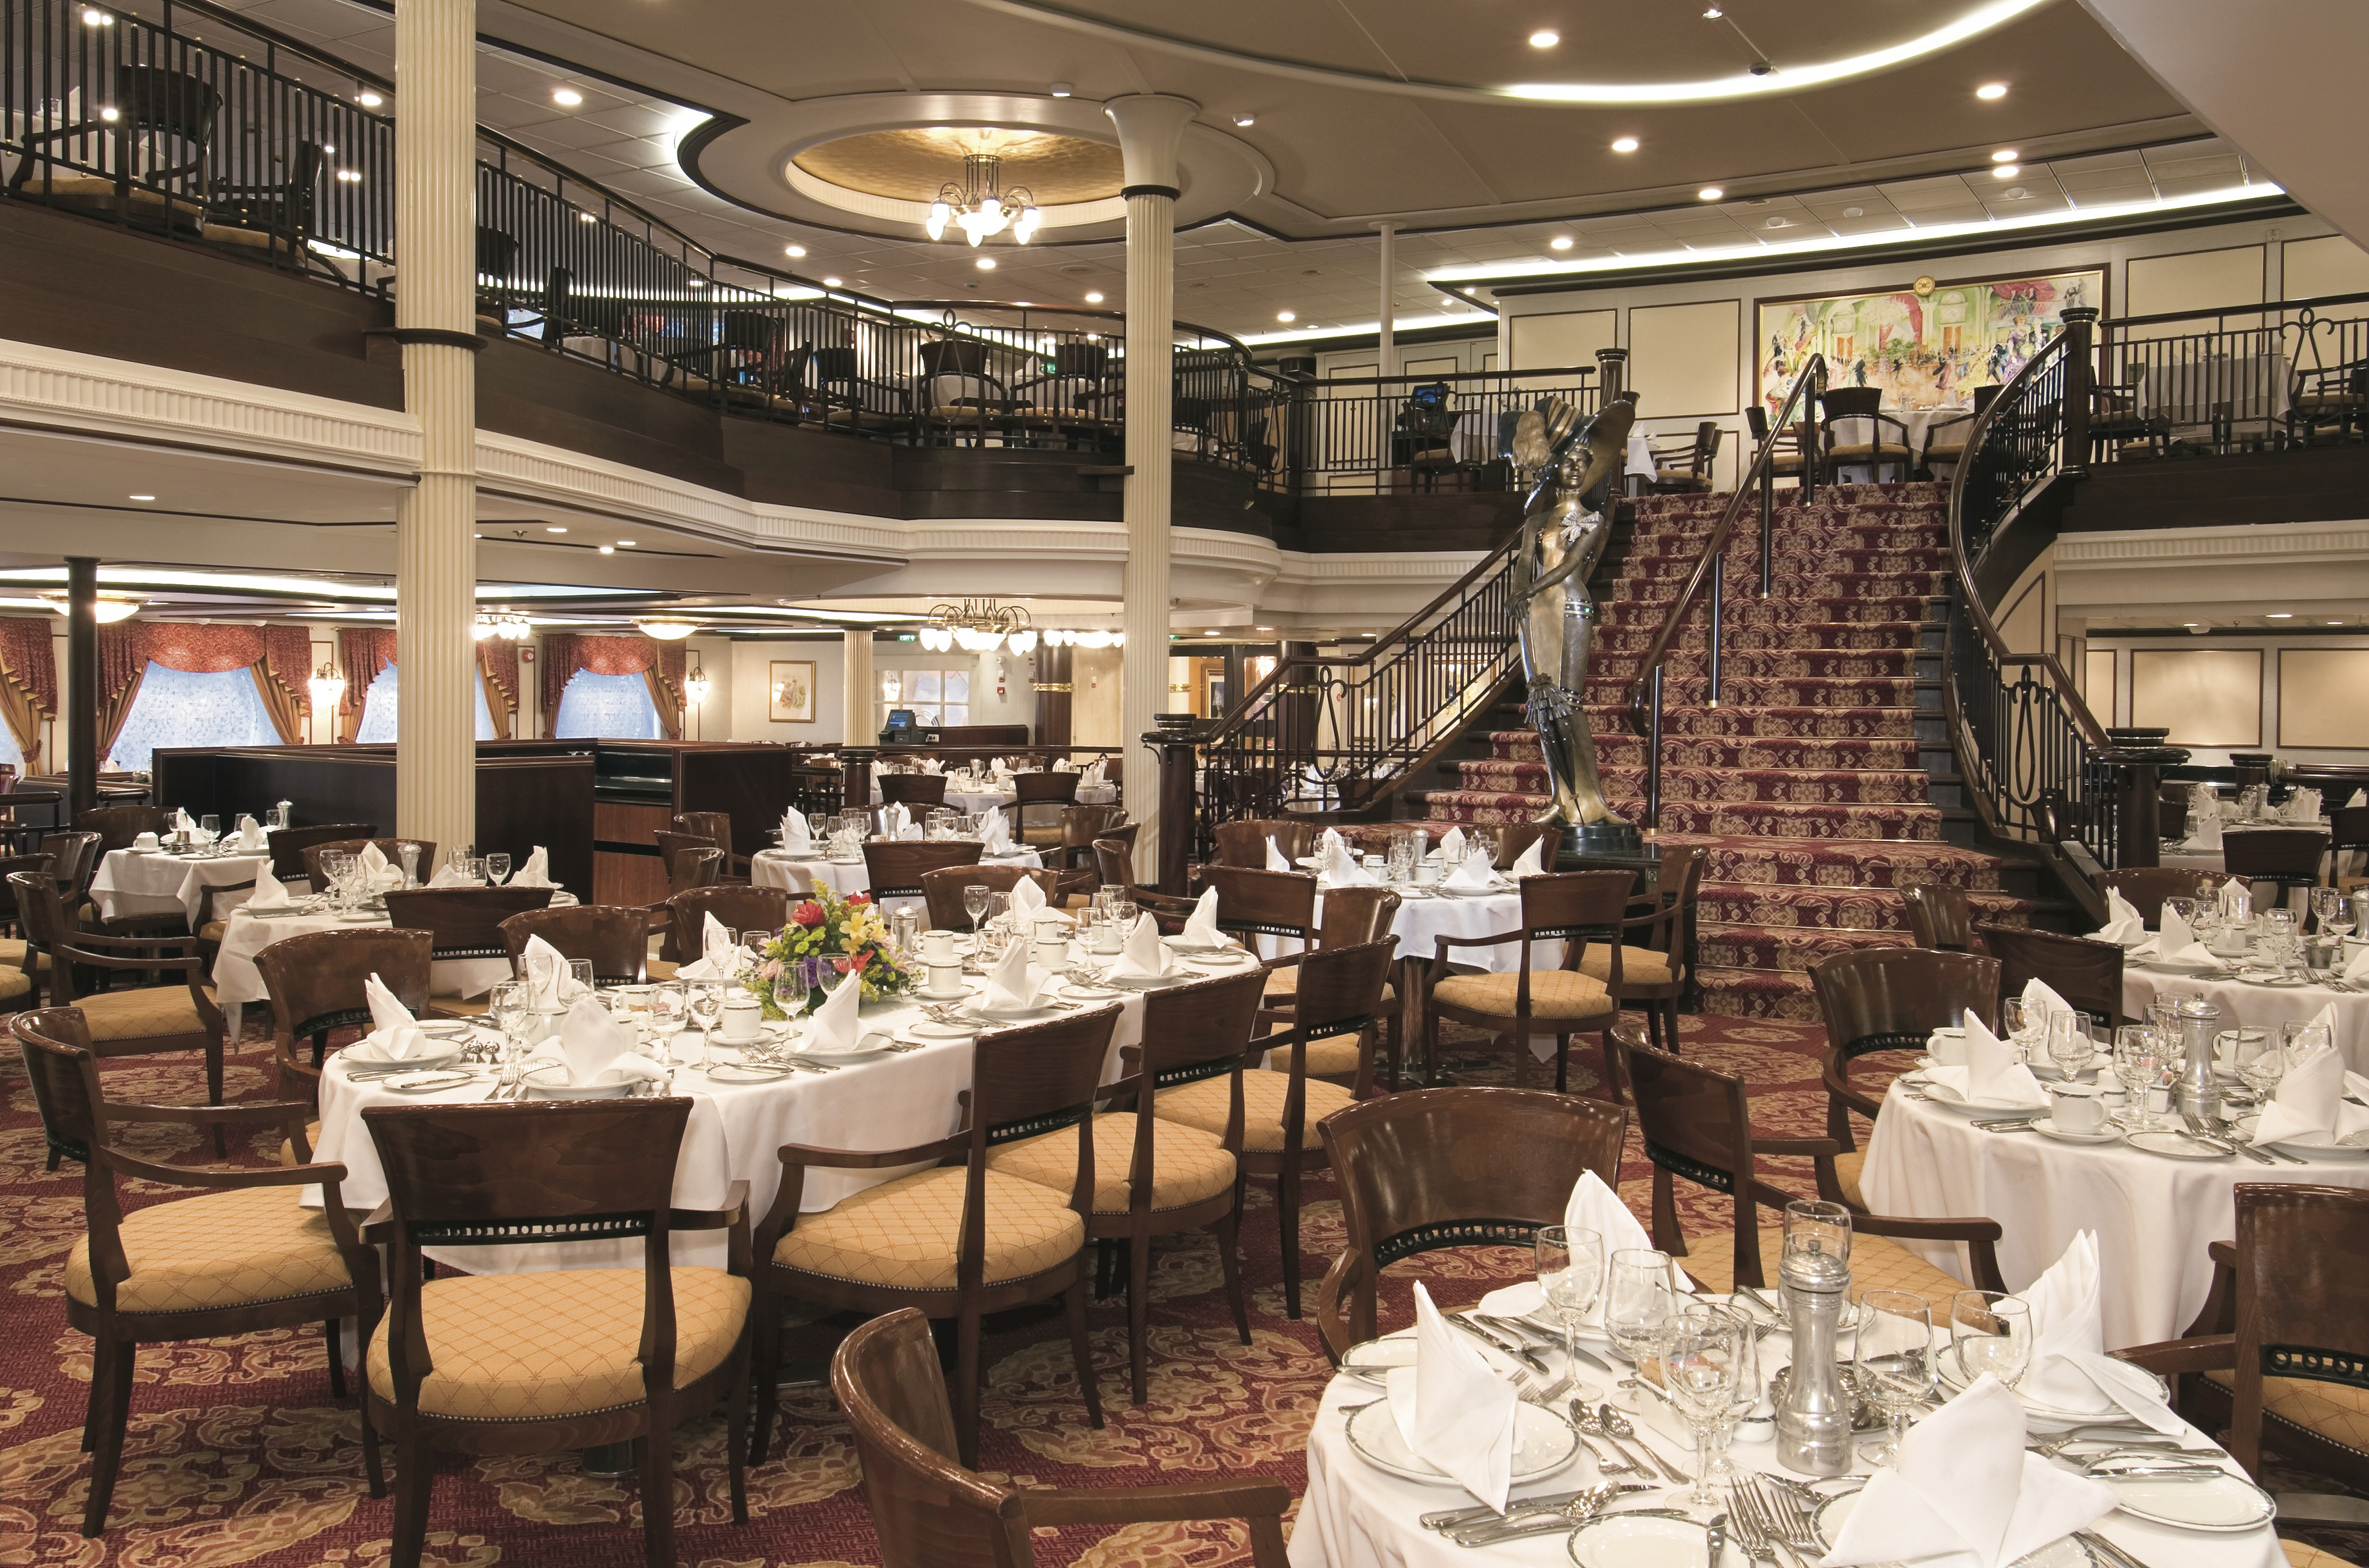 Royal Caribbean International Enchantment of the Seas Interior Dining Room.jpeg